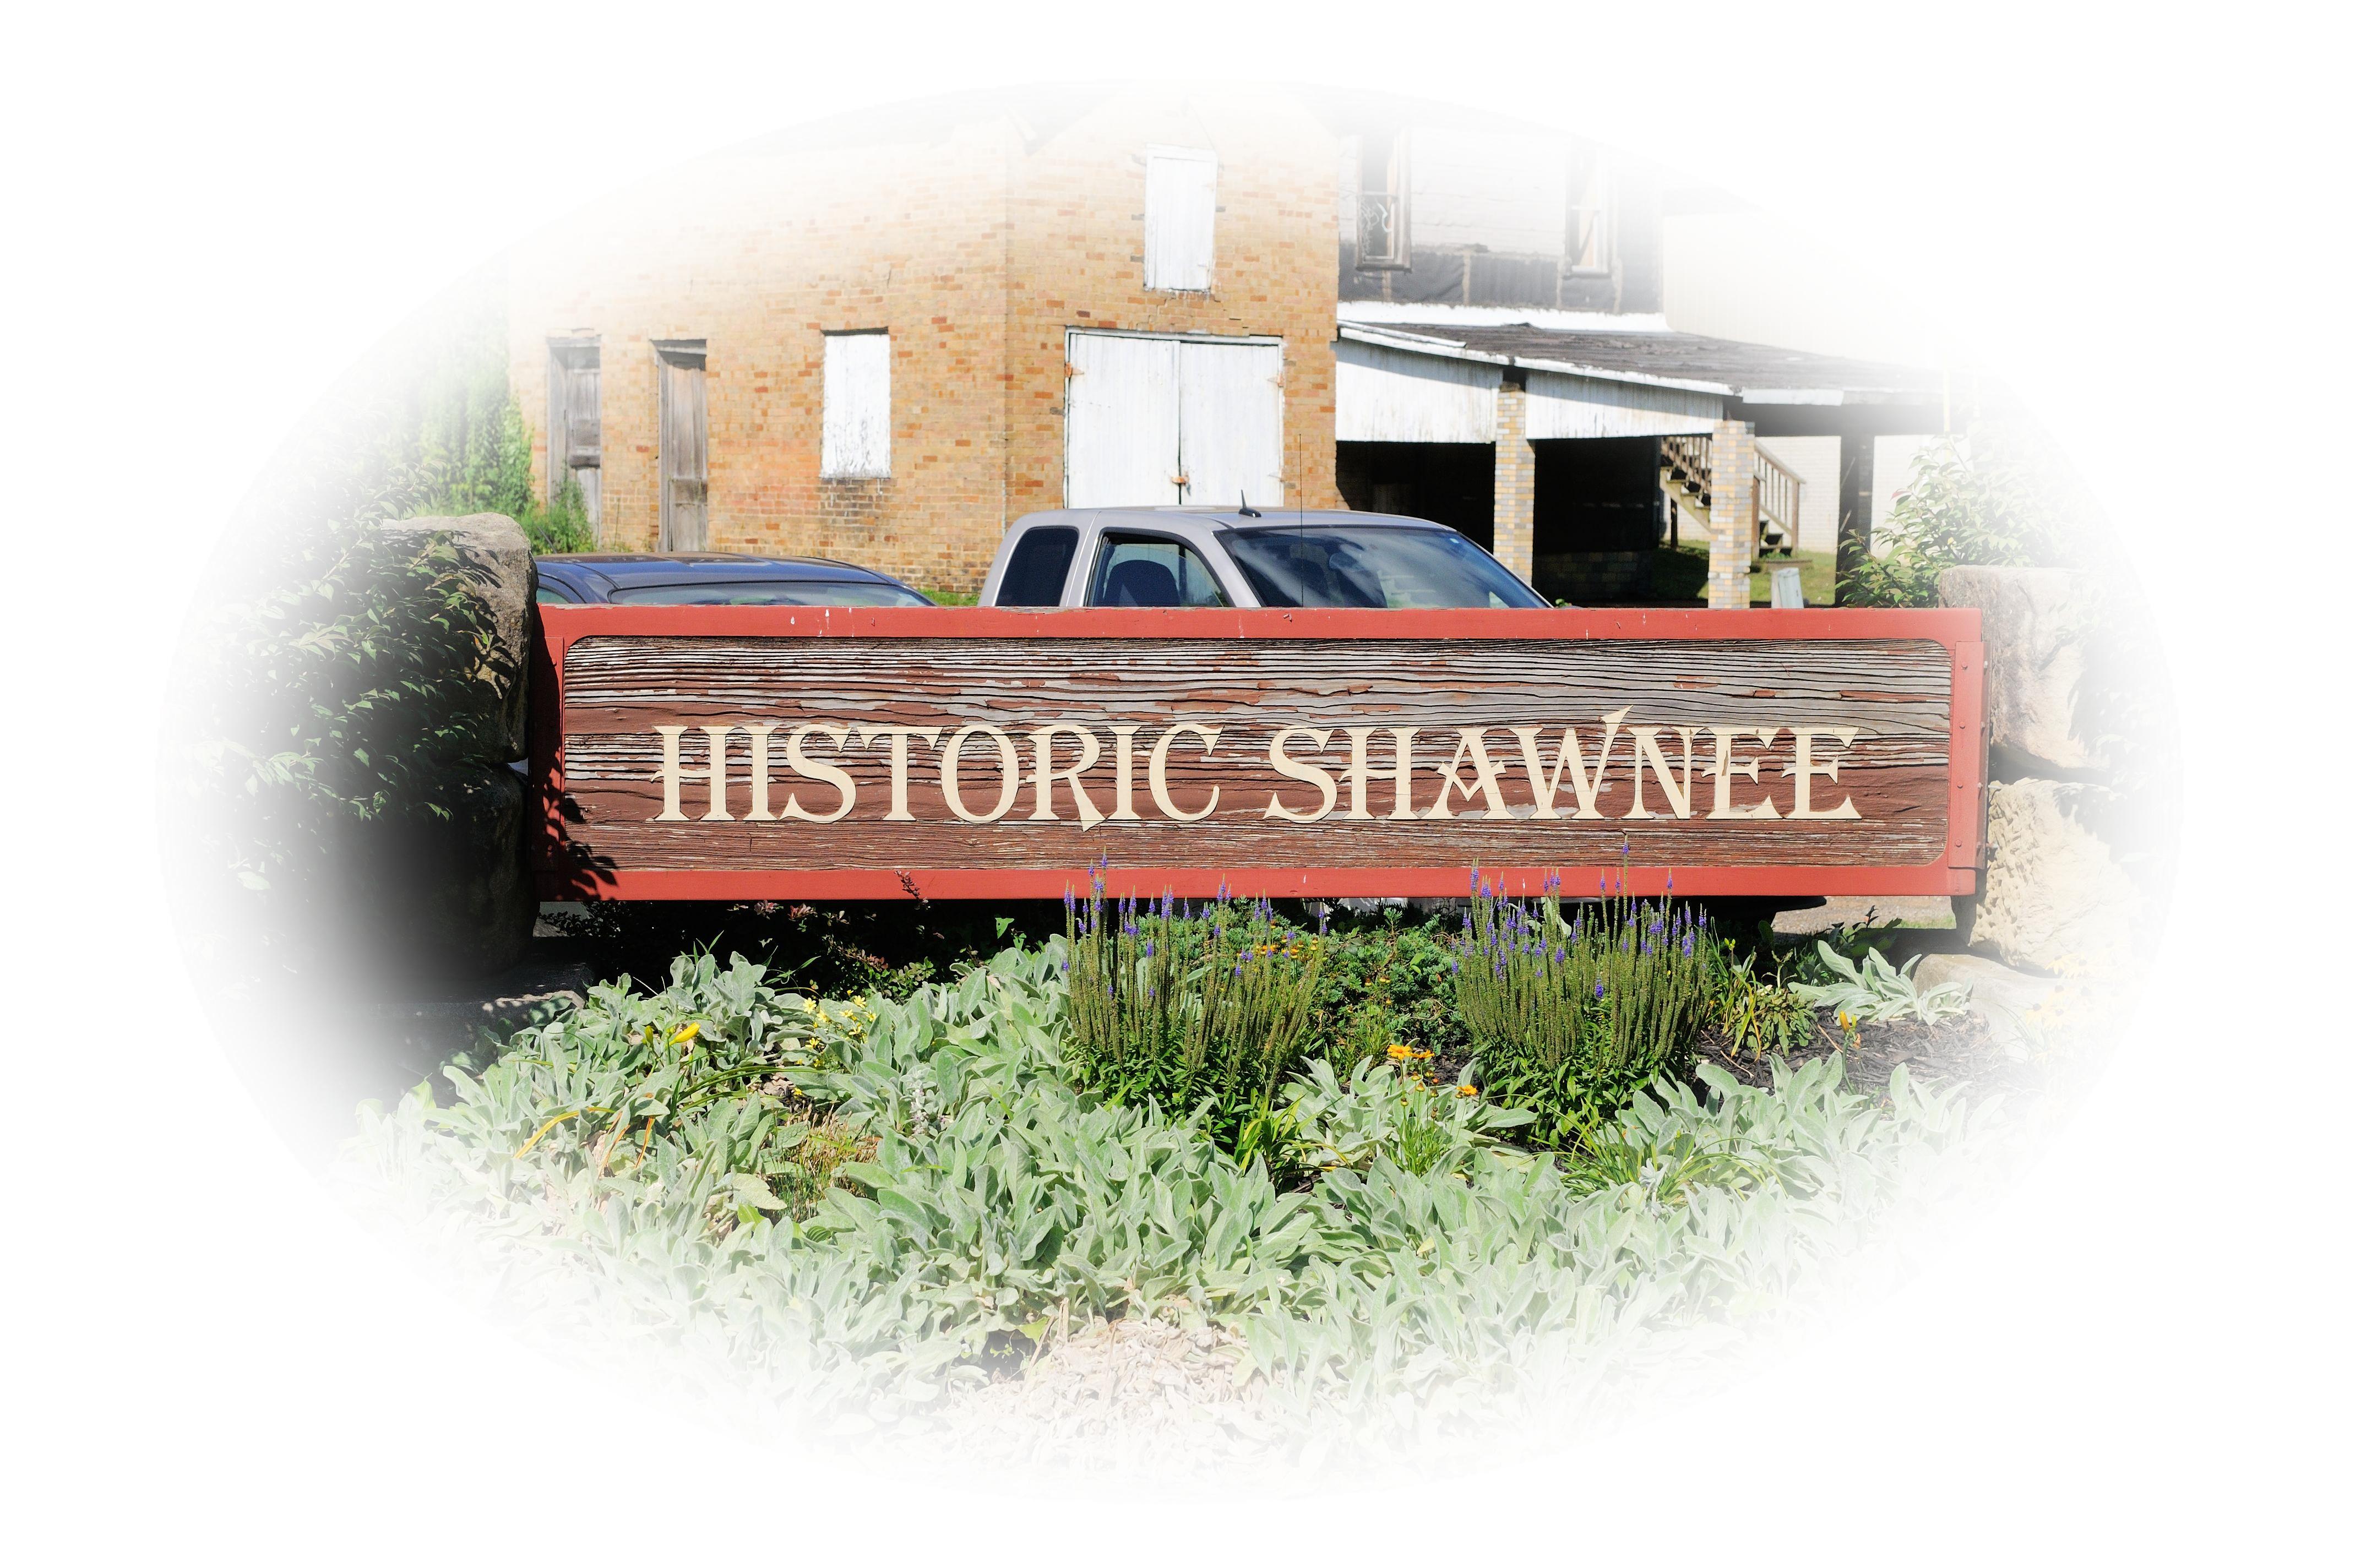 Shawnee First Friday Farmers Market   July 2, 2021